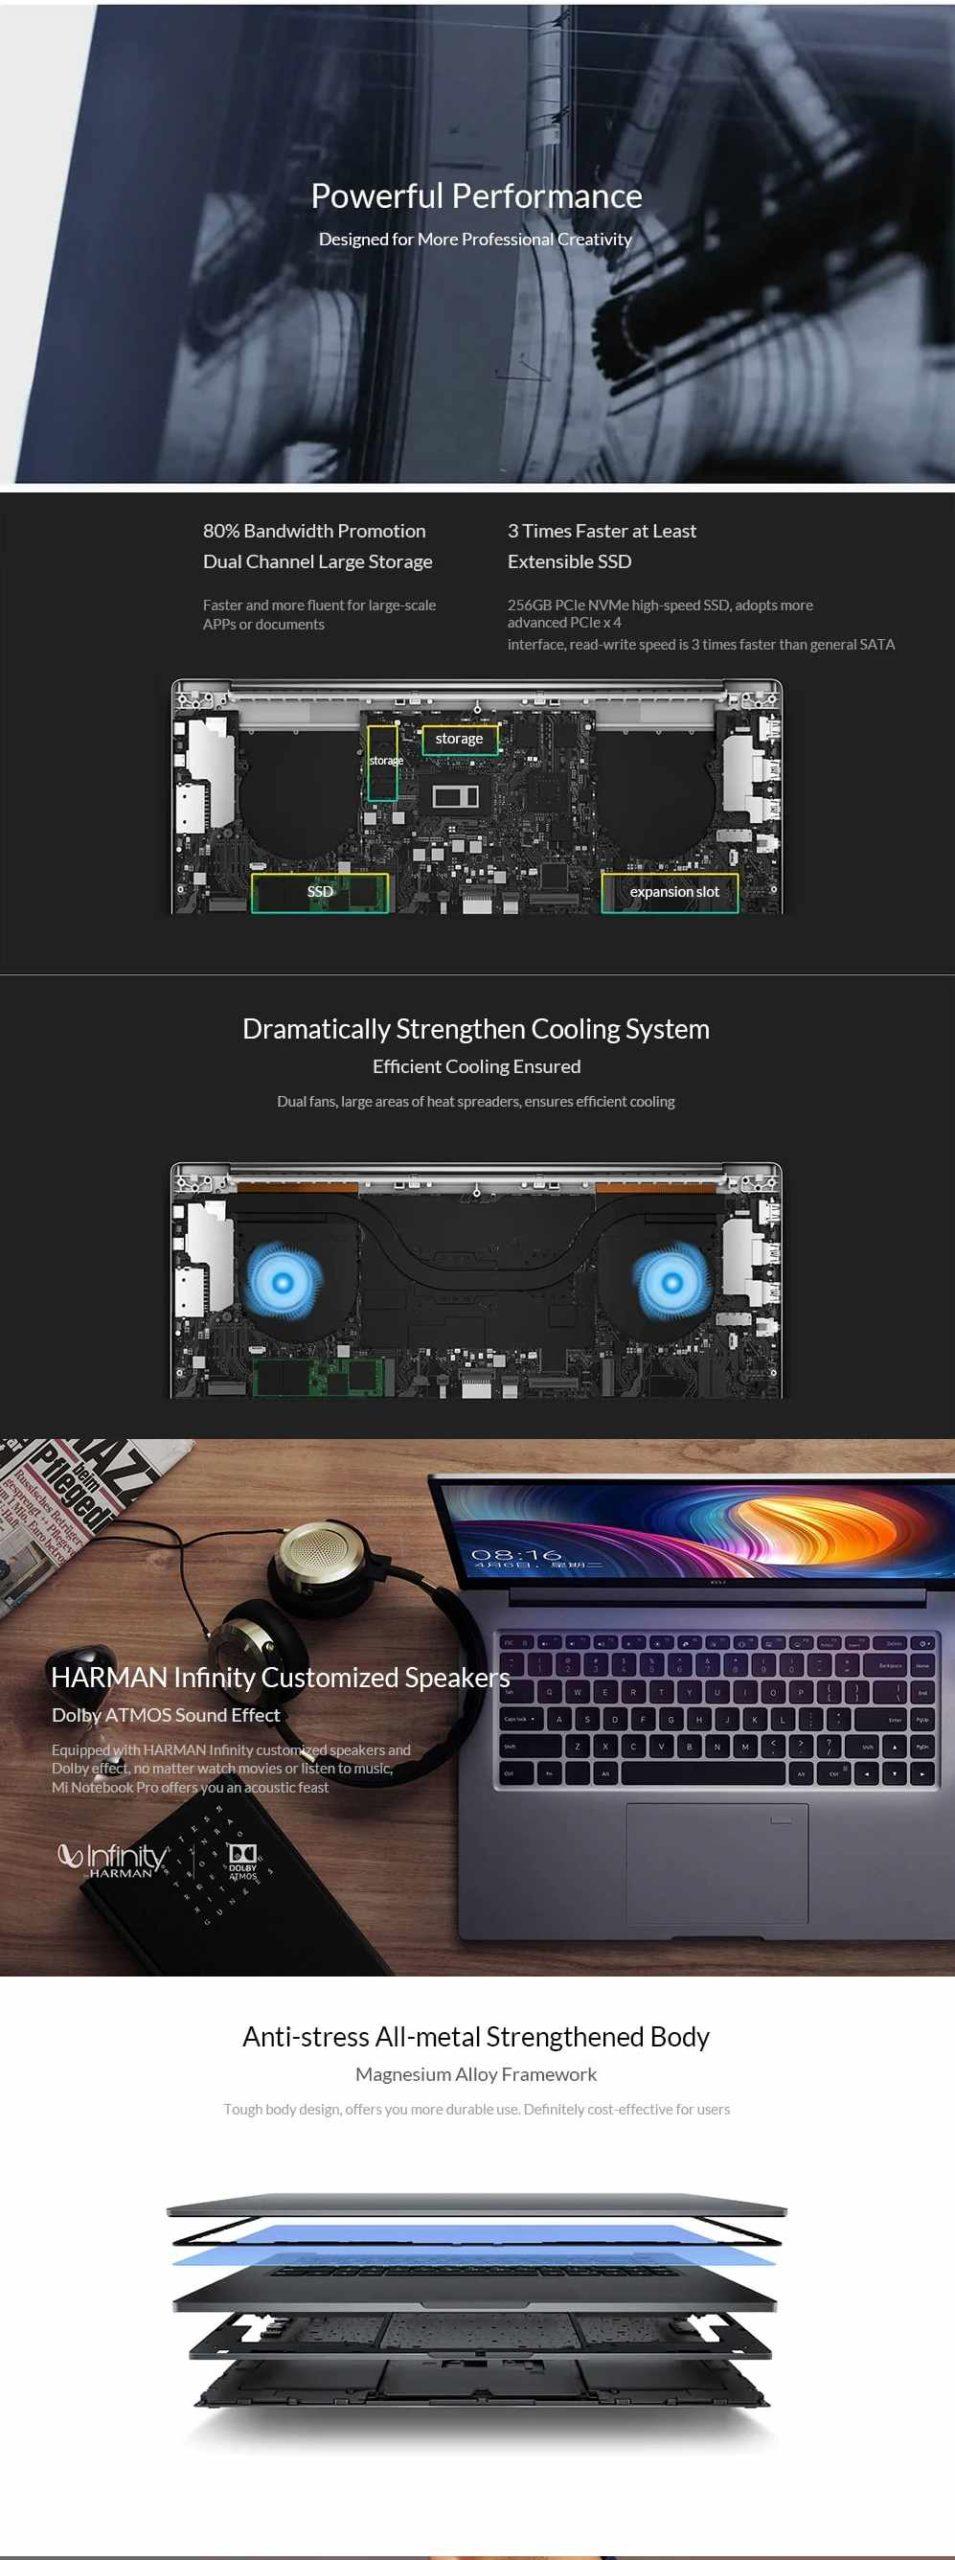 2019 XIAOMI Laptop Pro Intel Core i5-8250U GeForce MX250 Quad Core 15.6 Inch Win10 8G RAM 256G SSD Gaming Notebook Fingerprint